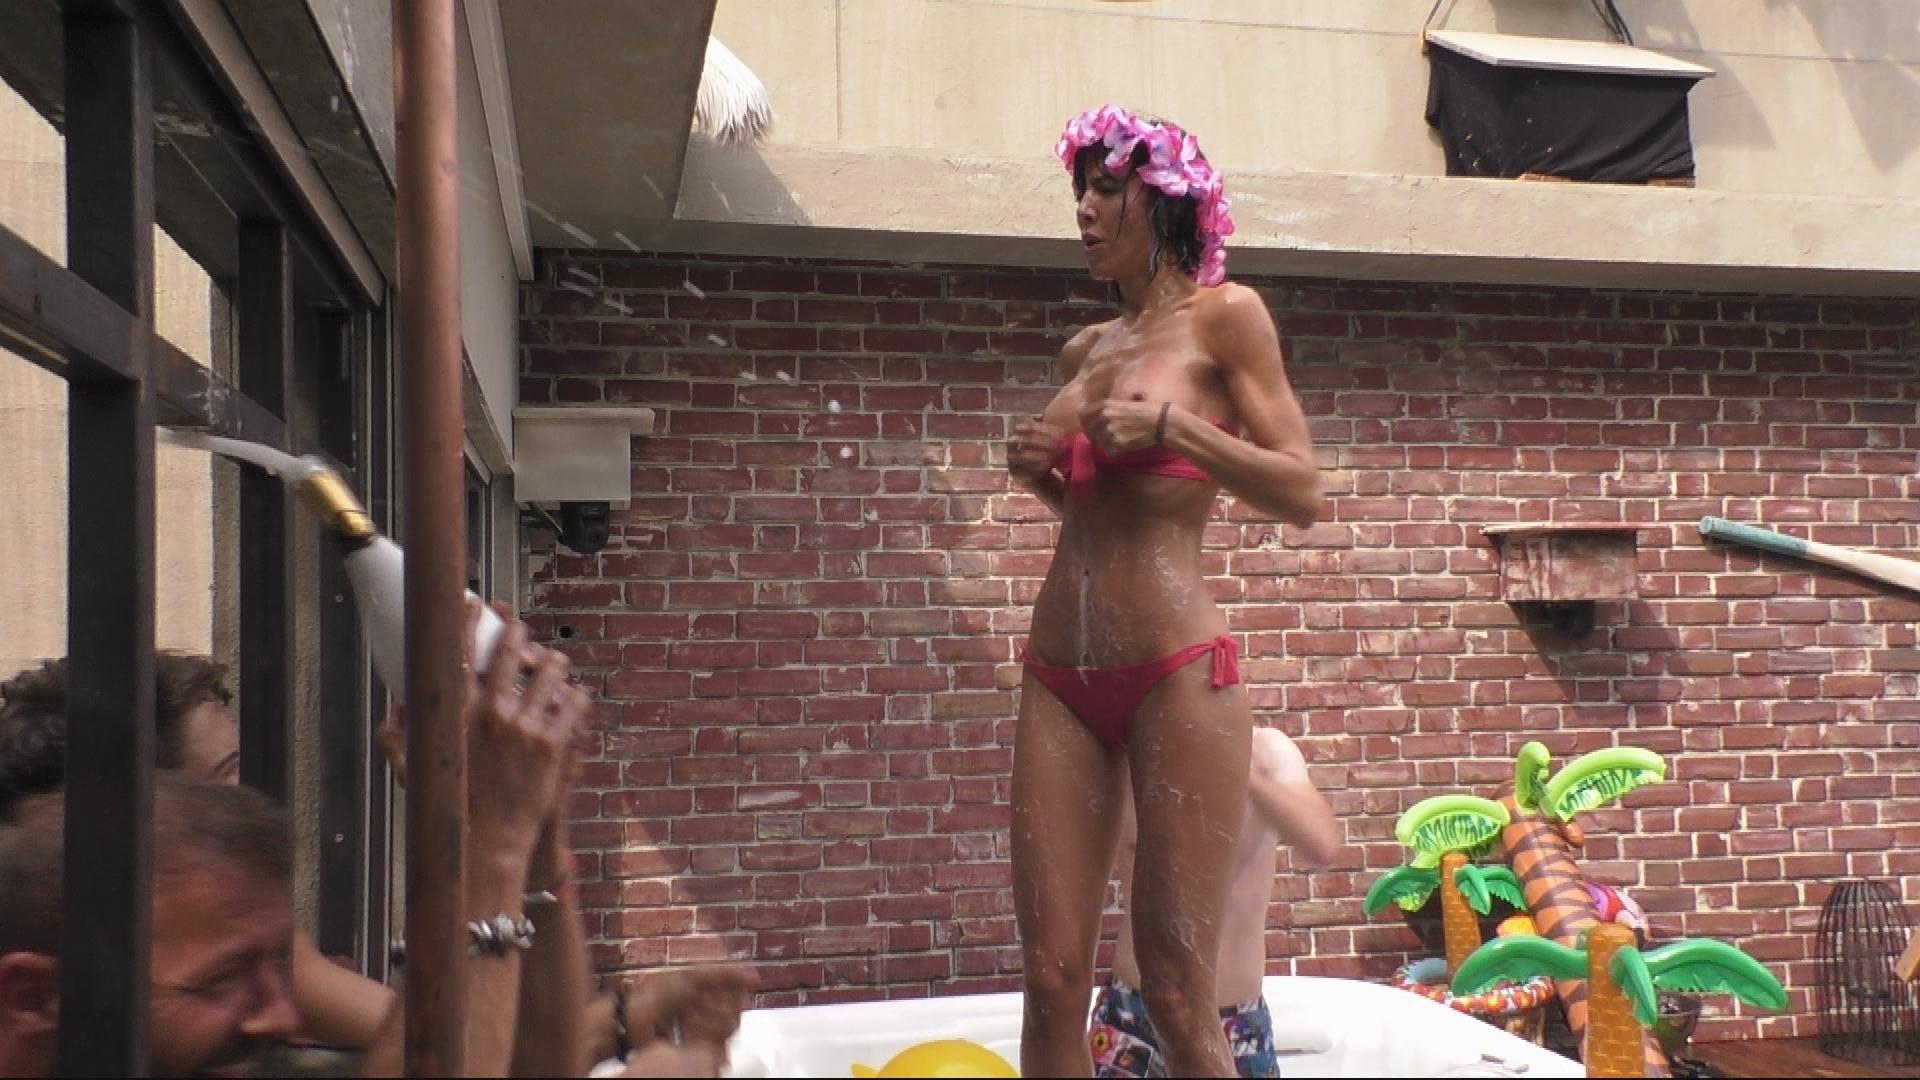 Promi Big Brother Claudia Obert Bei Poolparty Betrunken Galade